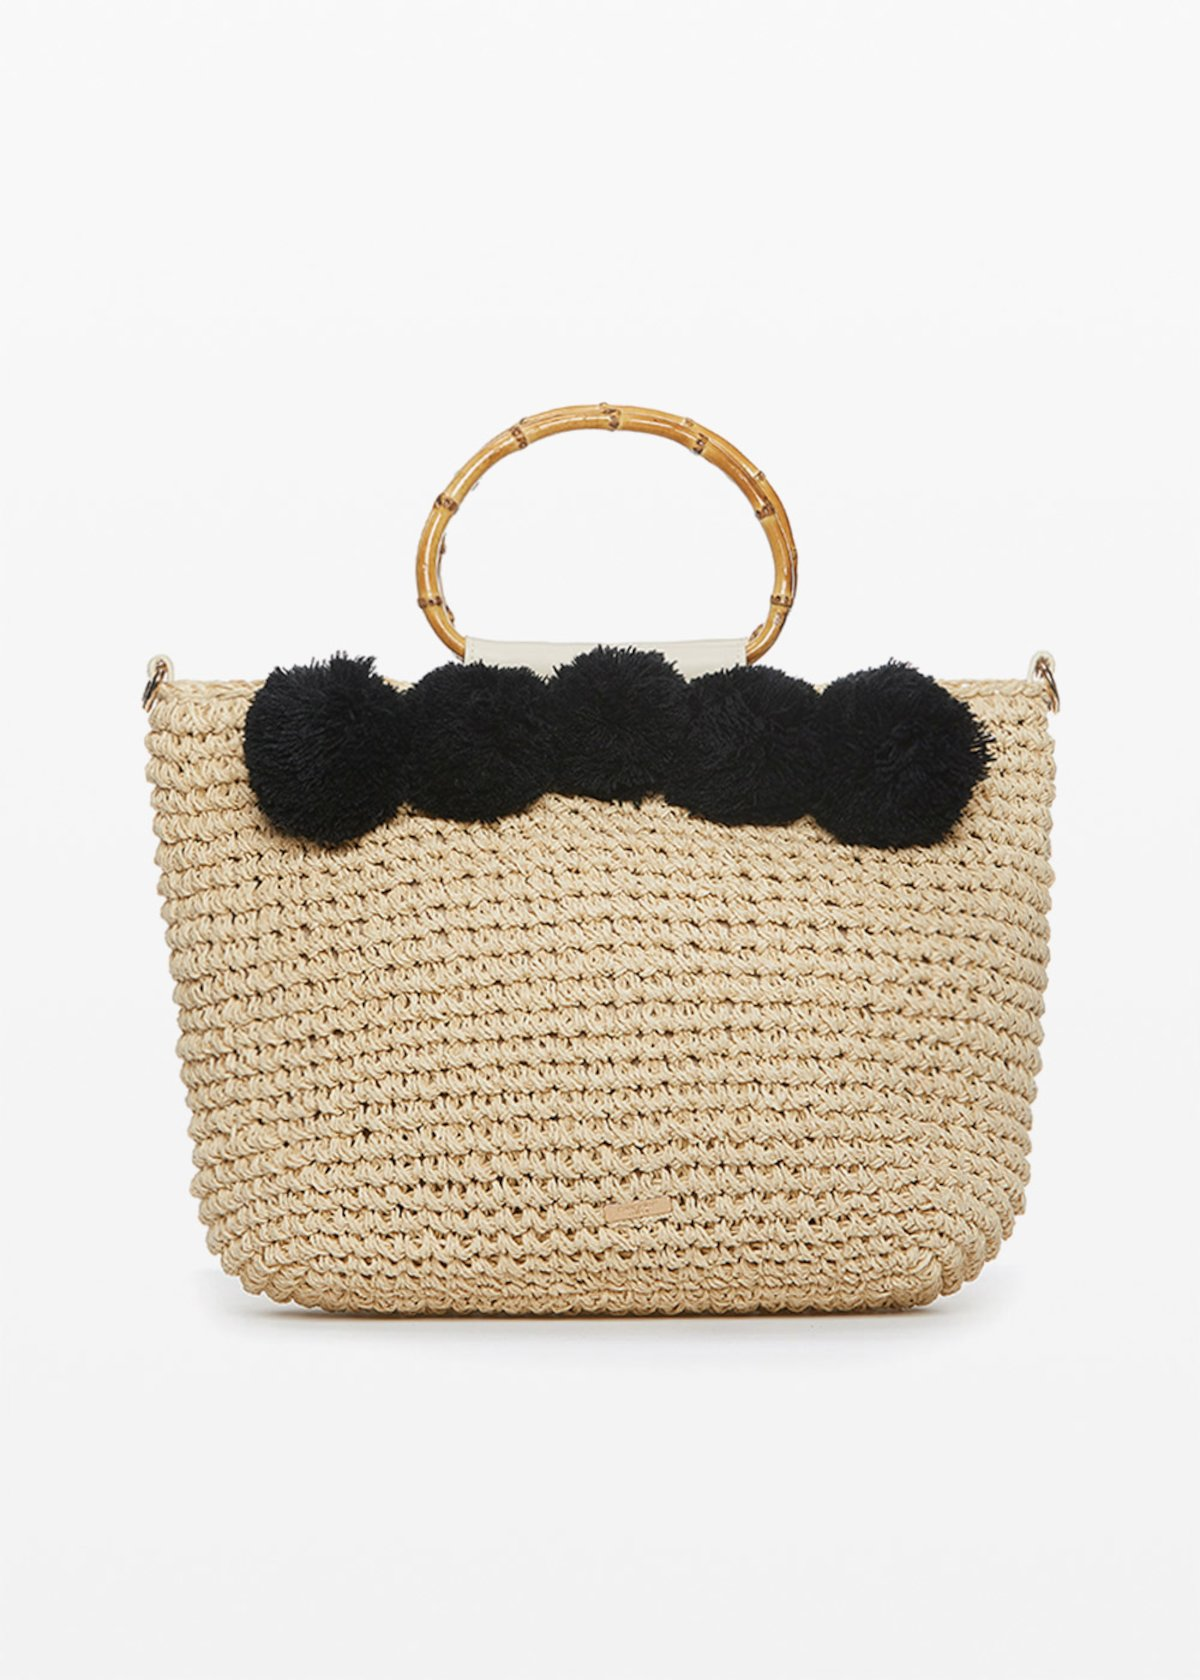 Straw Bag Benje with pompom decoration - Light Beige / Black - Woman